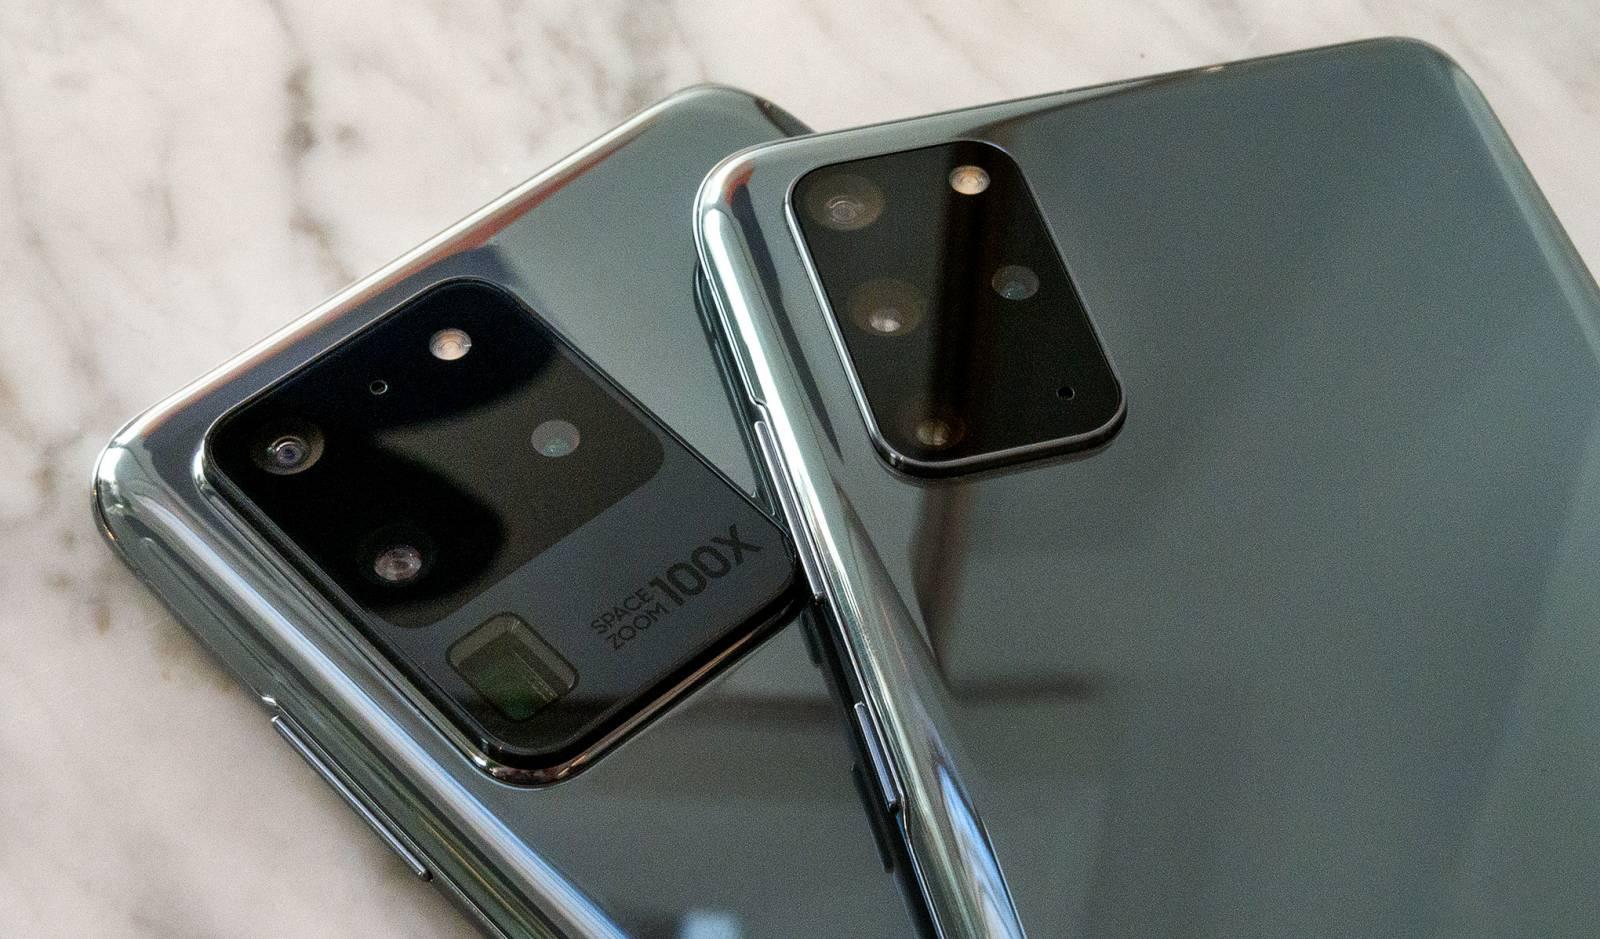 Samsung GALAXY S20 ULTRA profit